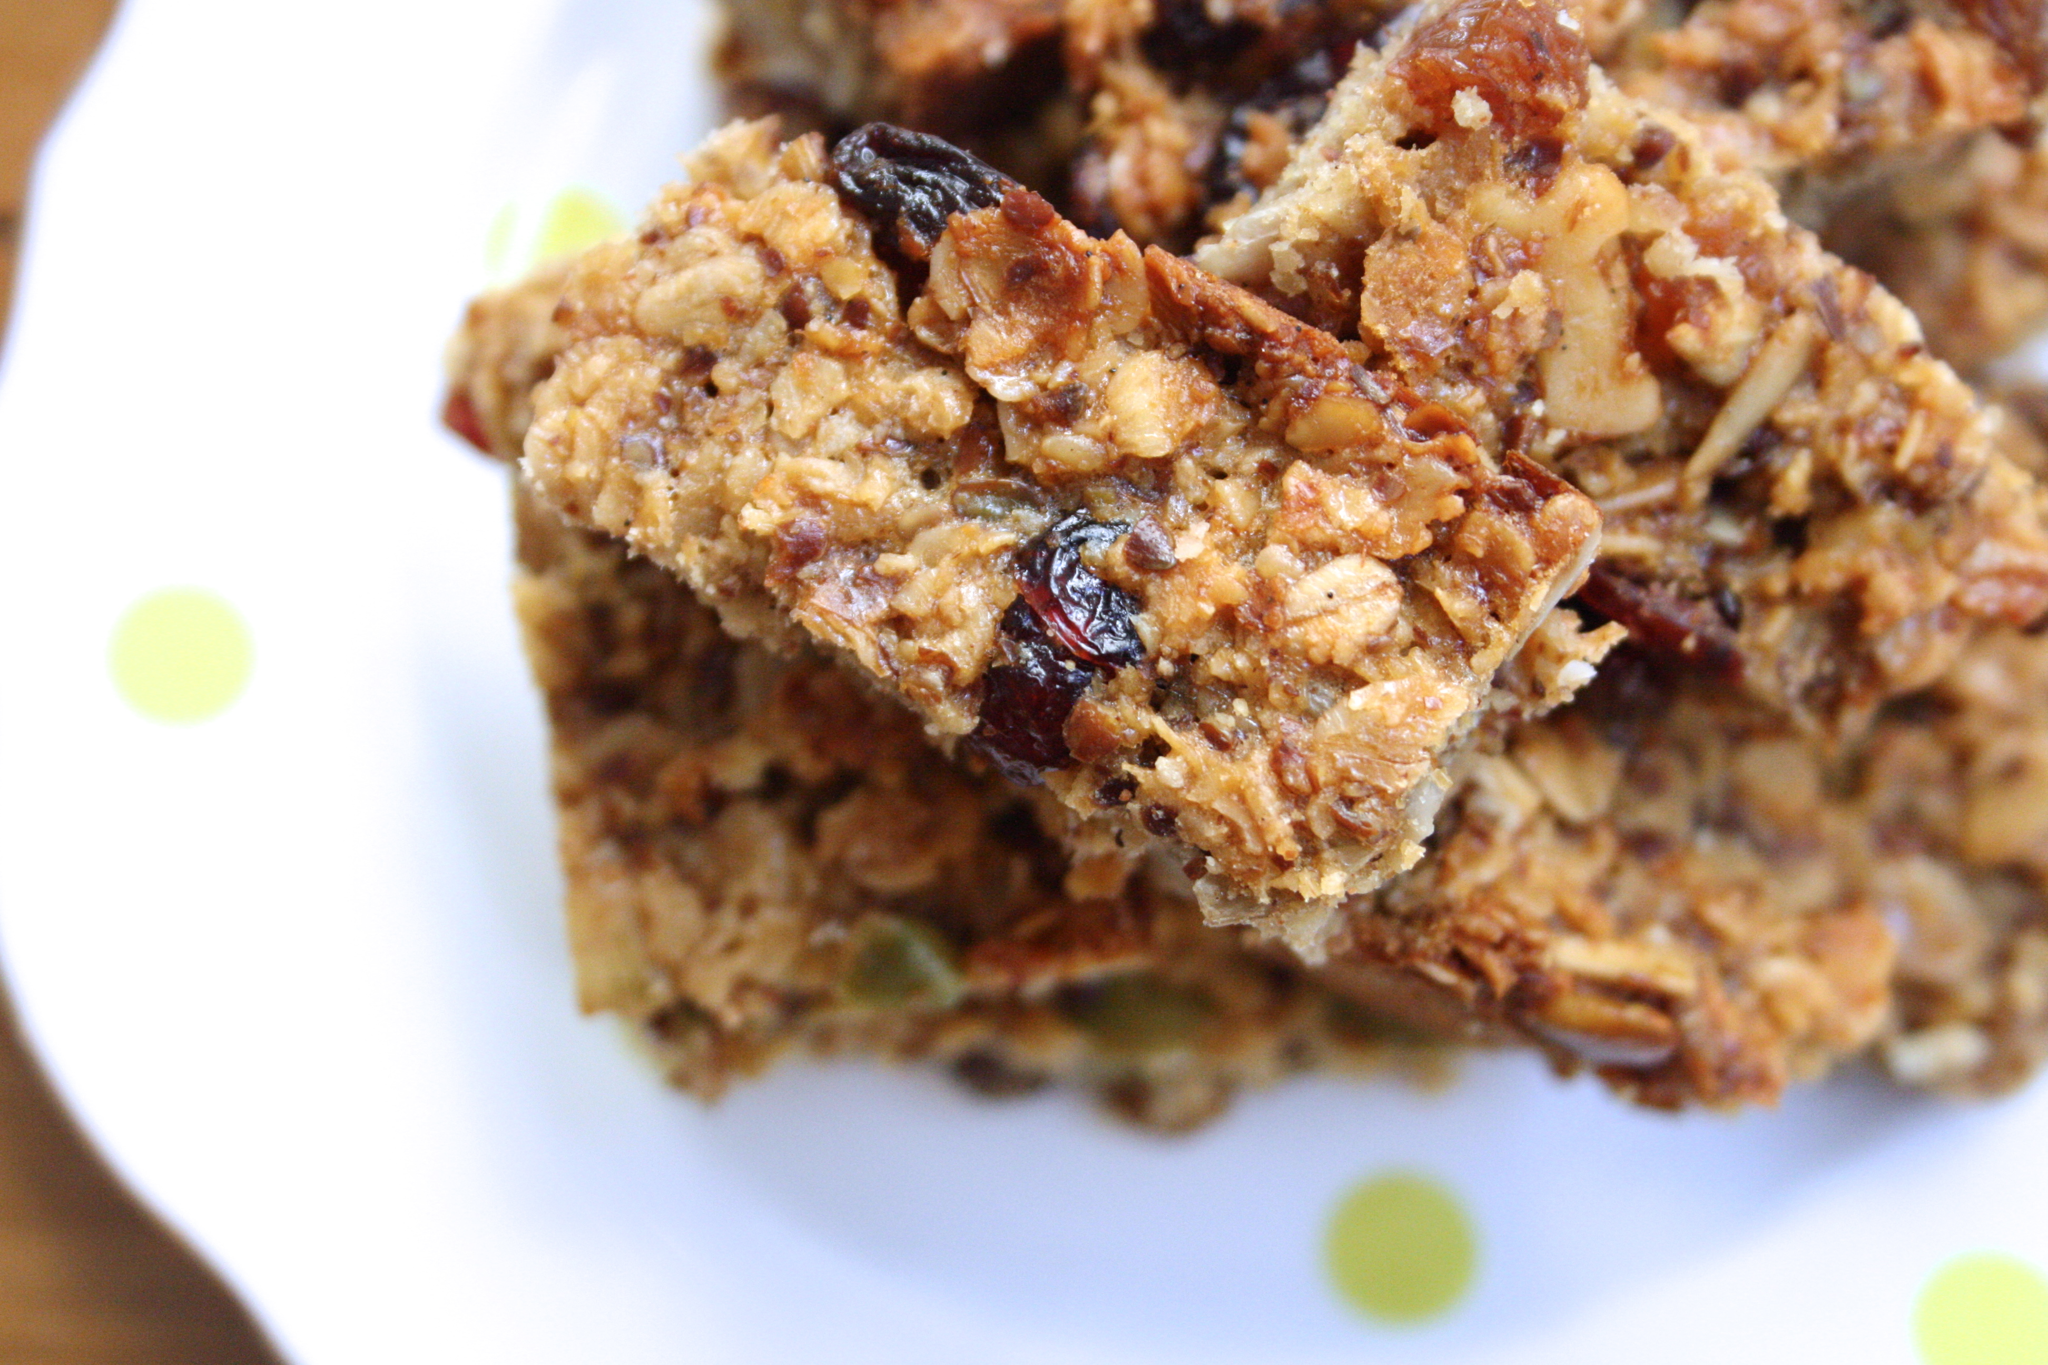 muesli bars, homemade muesli bars, healthy snacks, healthy food